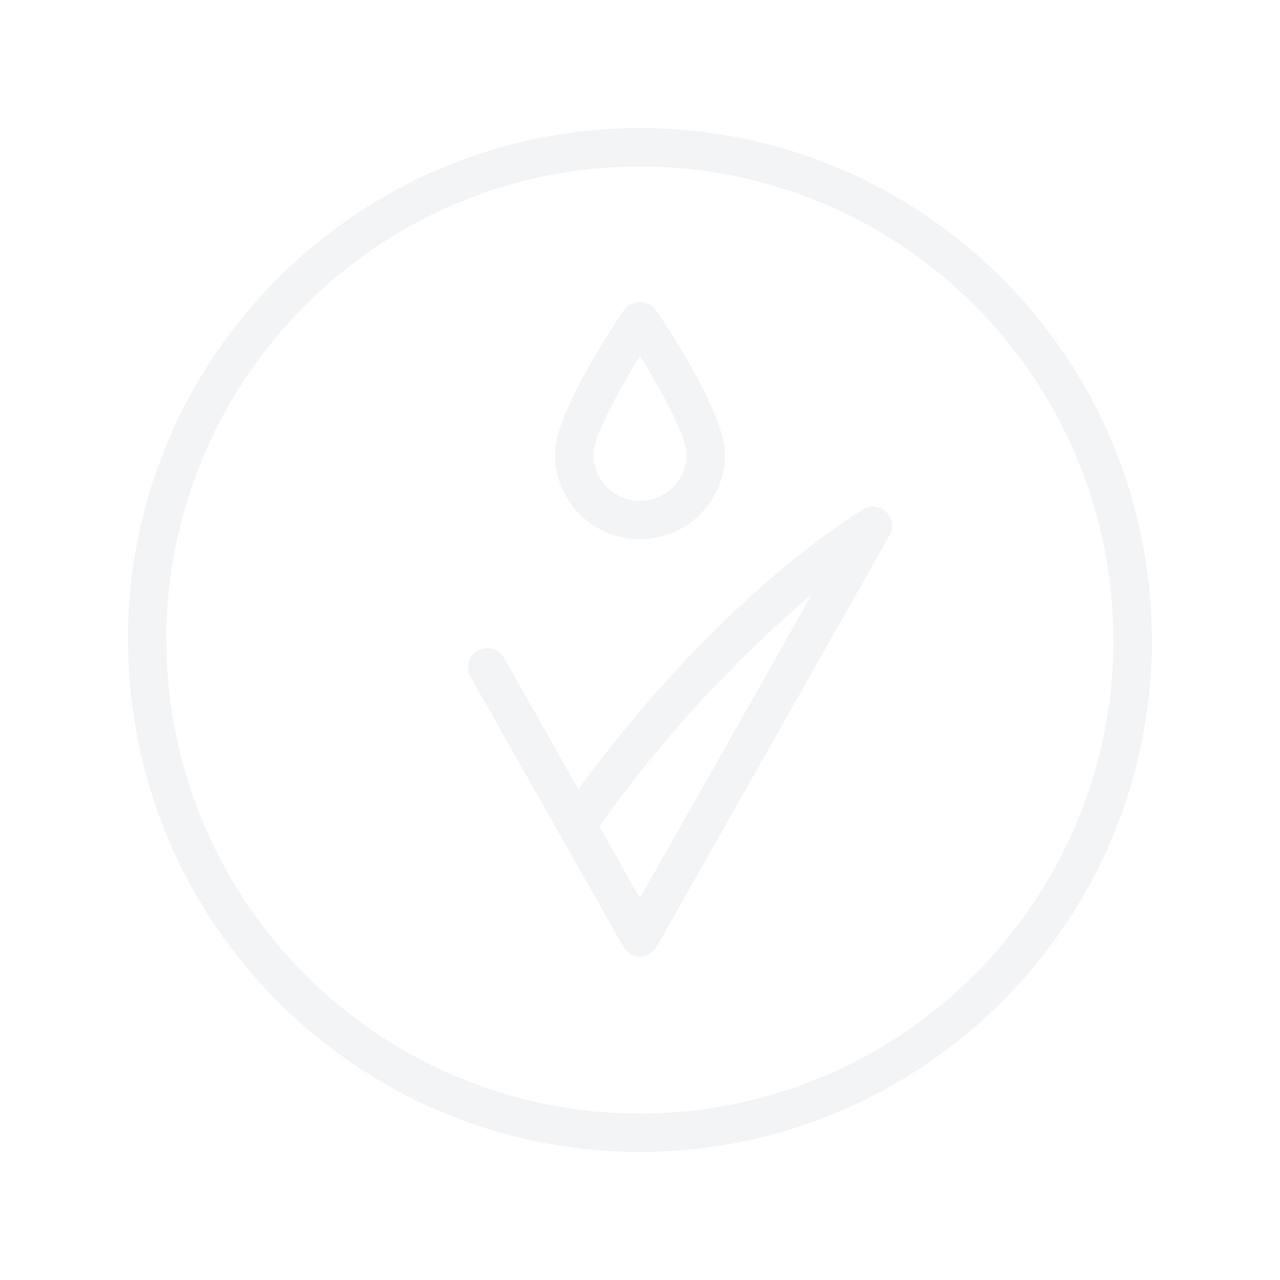 MIZON Joyful Time Essence Rose Mask 23g